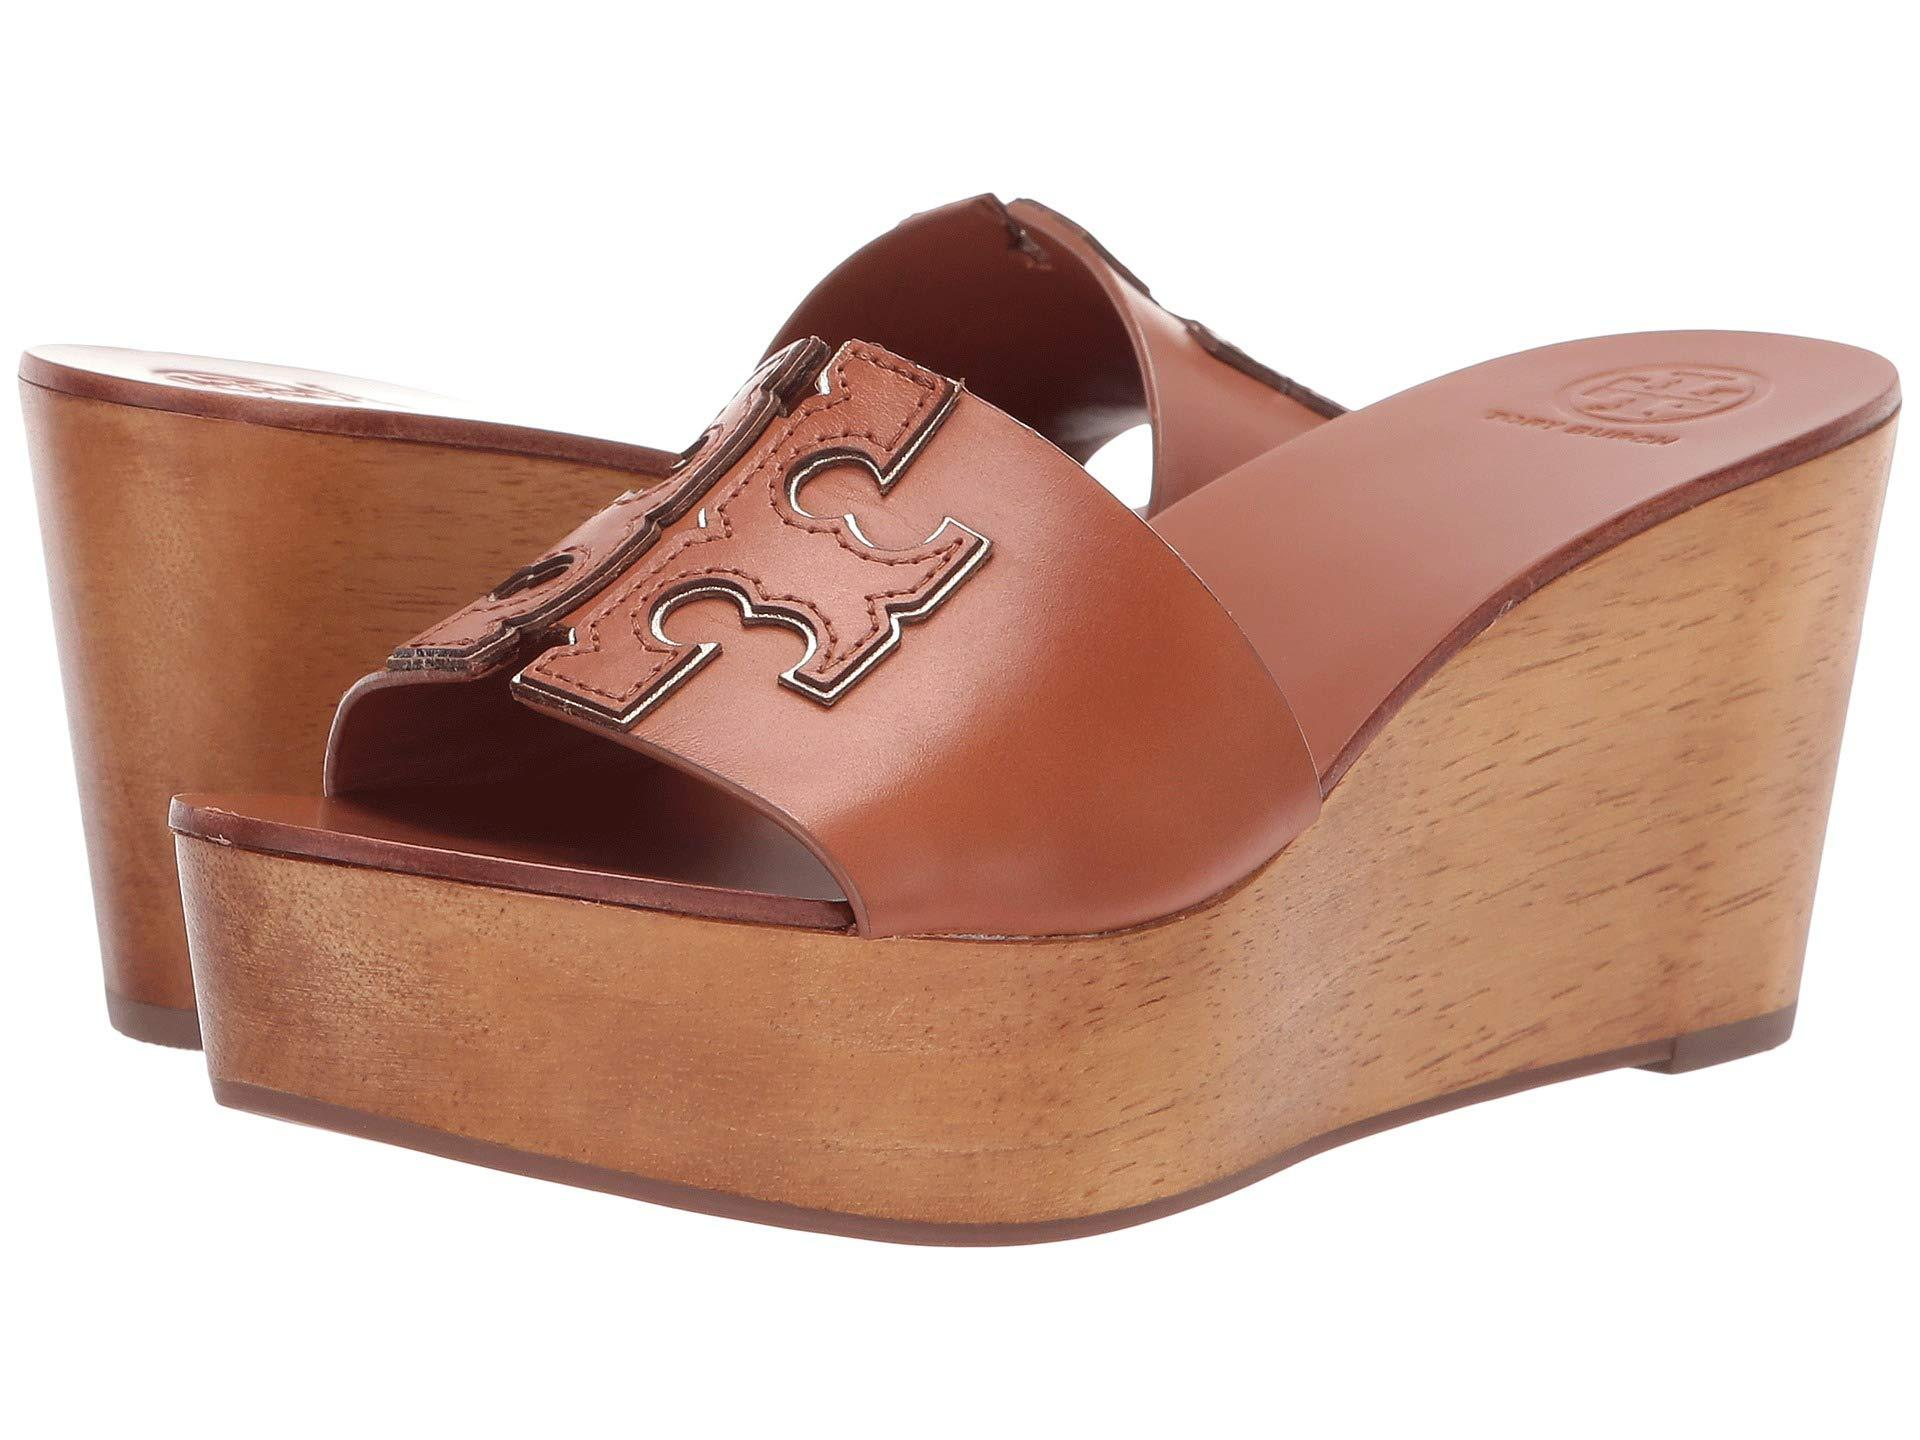 75935161d Lyst - Tory Burch Women s Ines Wedge Platform Slide Sandals in Brown ...